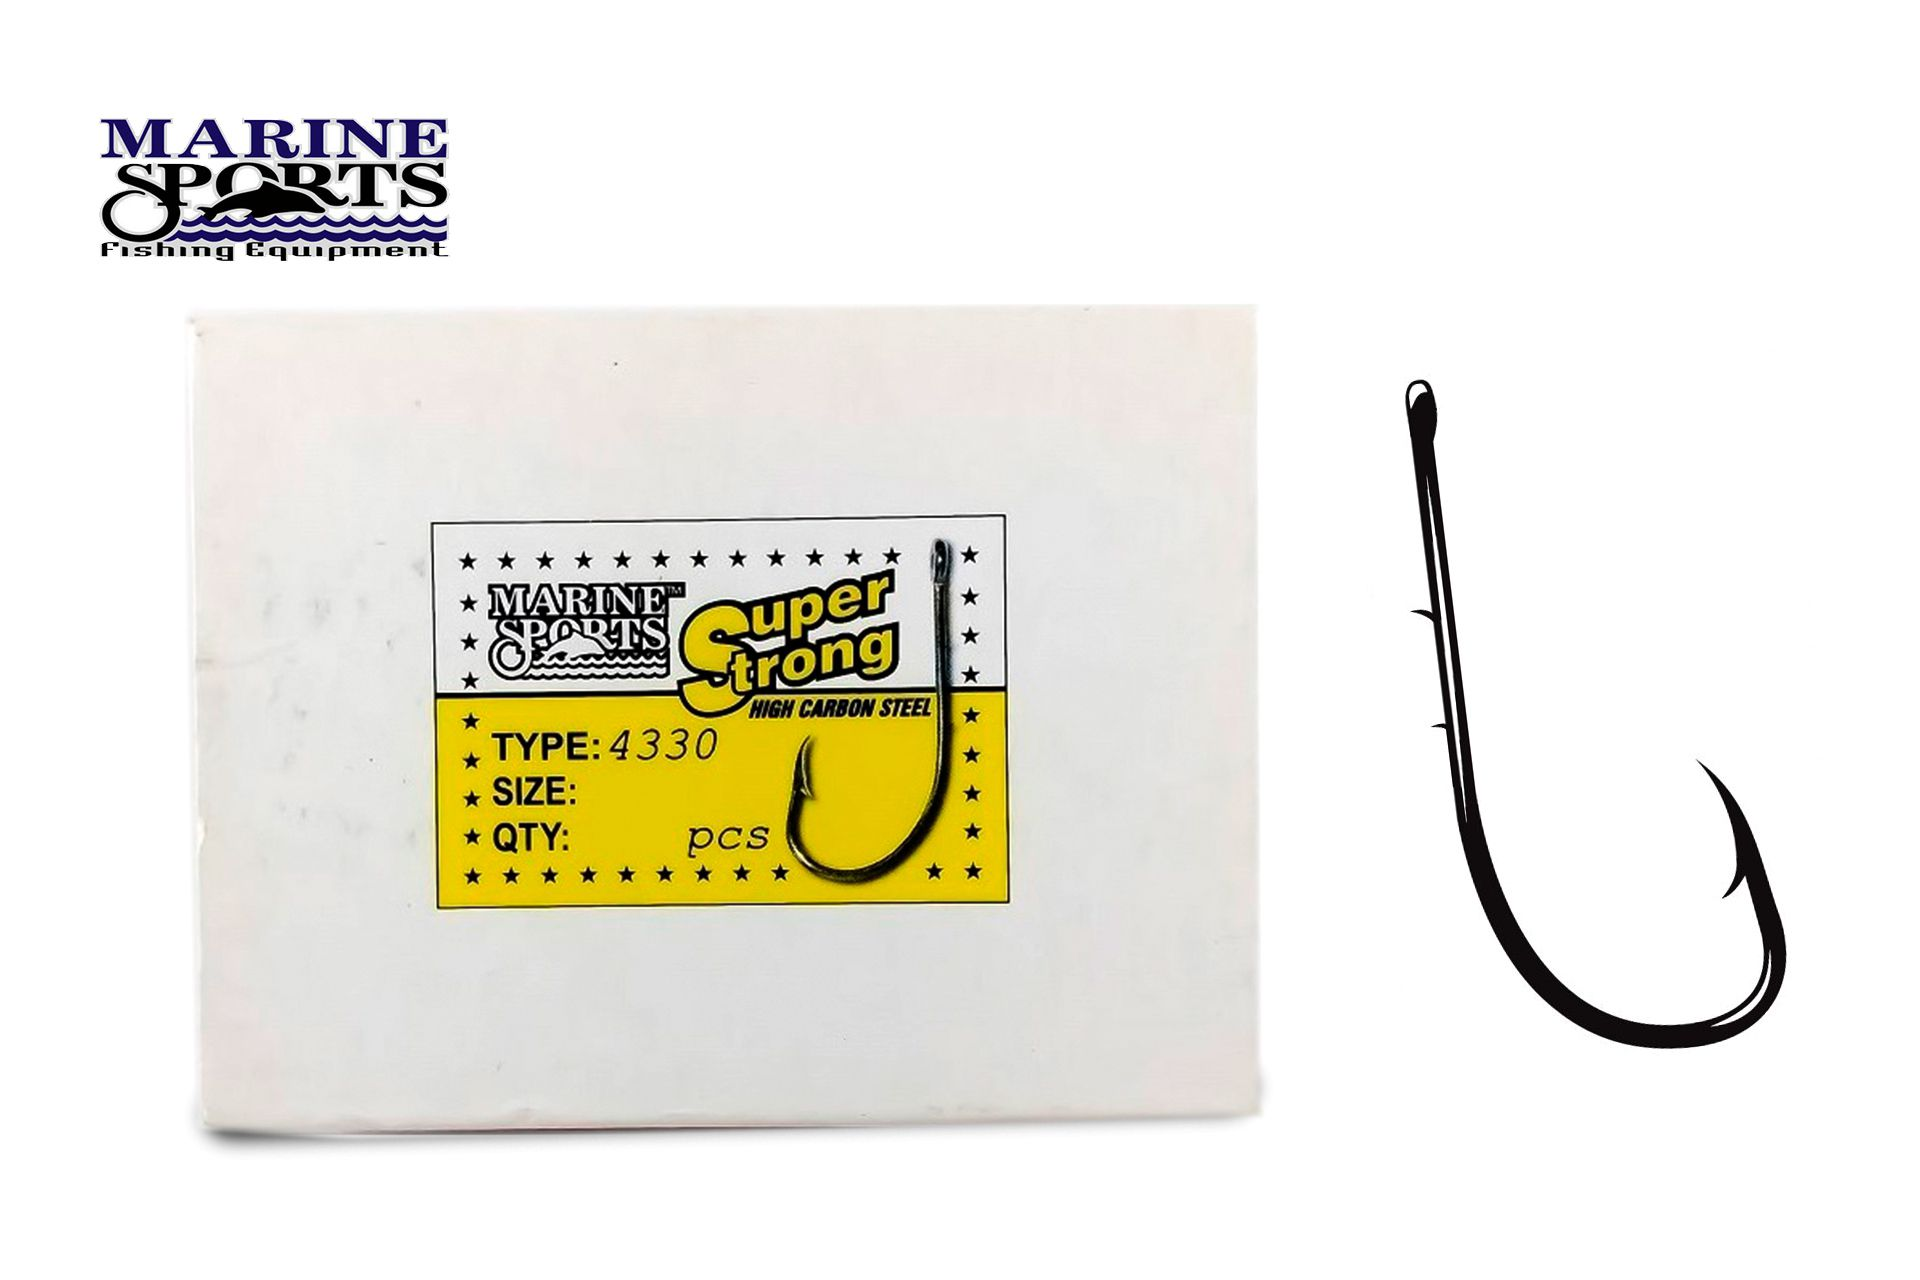 Anzol Marine Sports Super Strong 4330 N°12 (1,5cm) C/ Farpas - 100 Peças